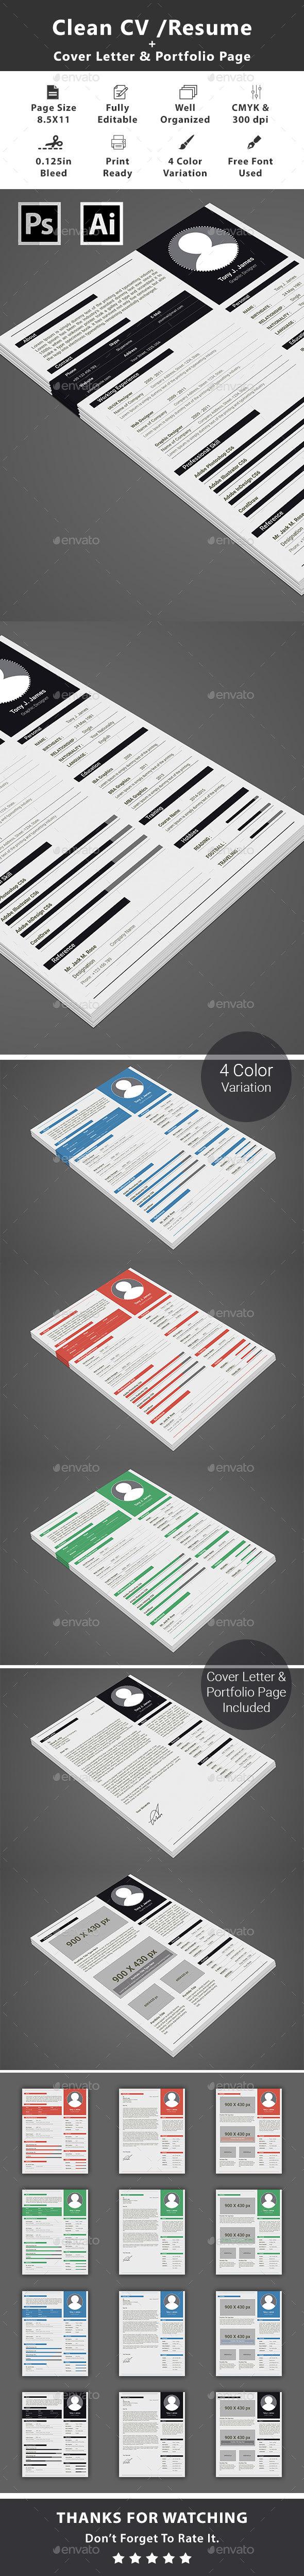 Clean CV/Resume Resumes Stationery Resume words skills